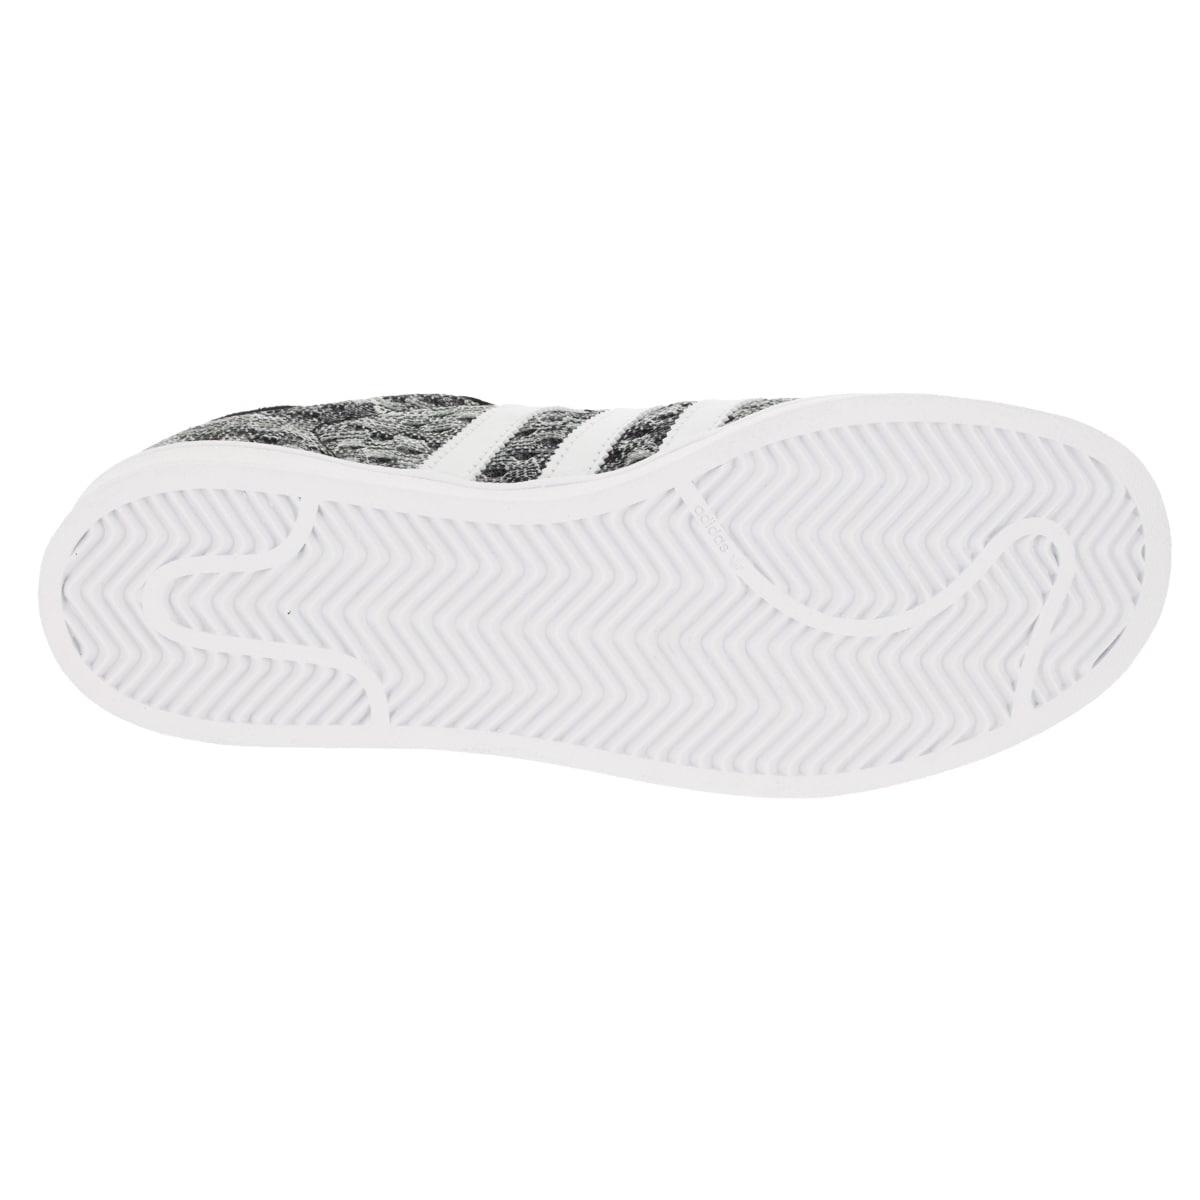 94a66f6c0 Shop Adidas Men s Superstar Gid Originals Black White White Basketball Shoe  - Free Shipping Today - Overstock - 12320113